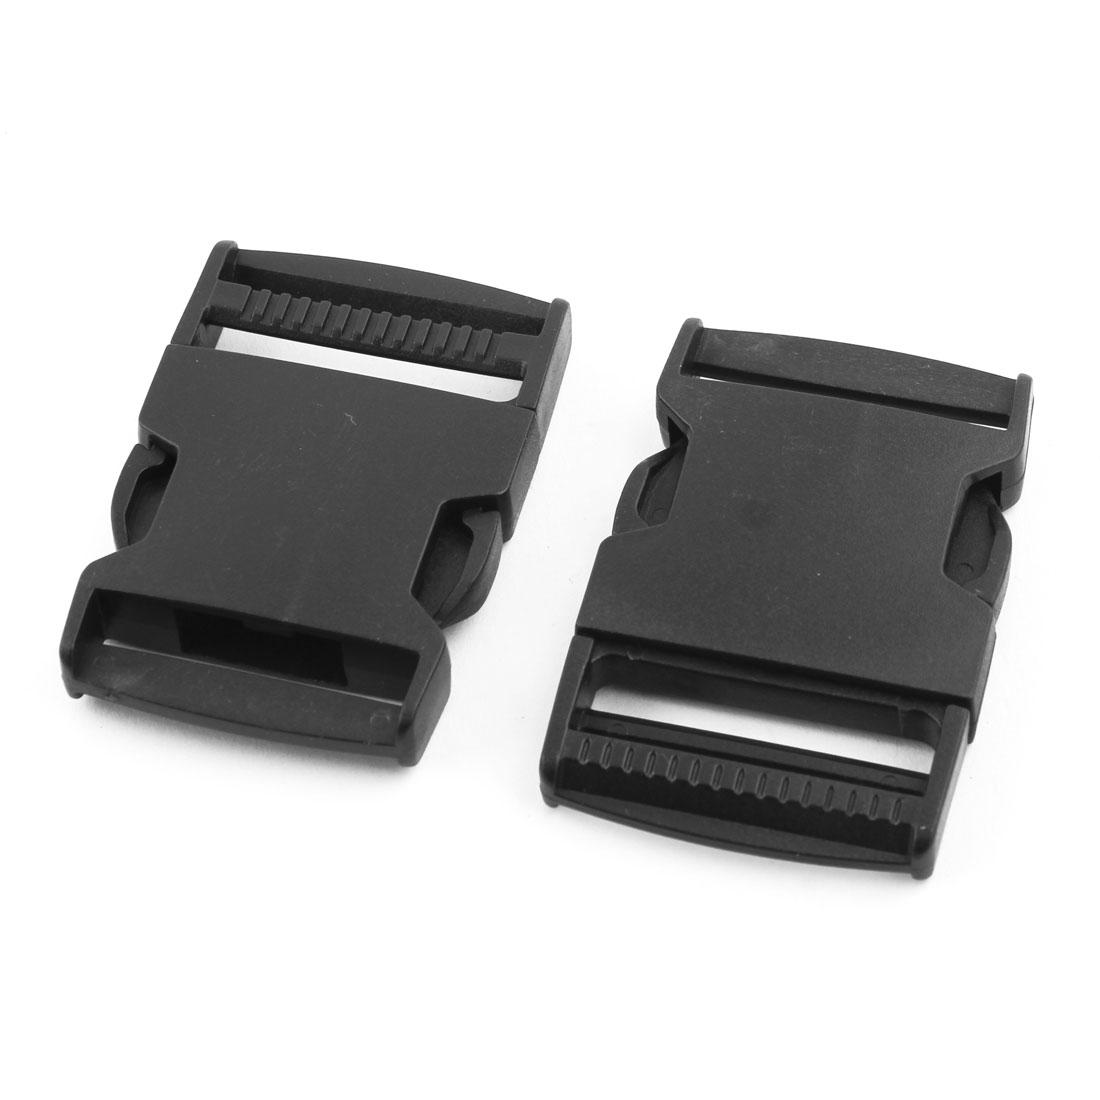 Belt Strap Plastic Flat Side Release Buckle Black 1.5 Inches Inside Width - image 1 of 3